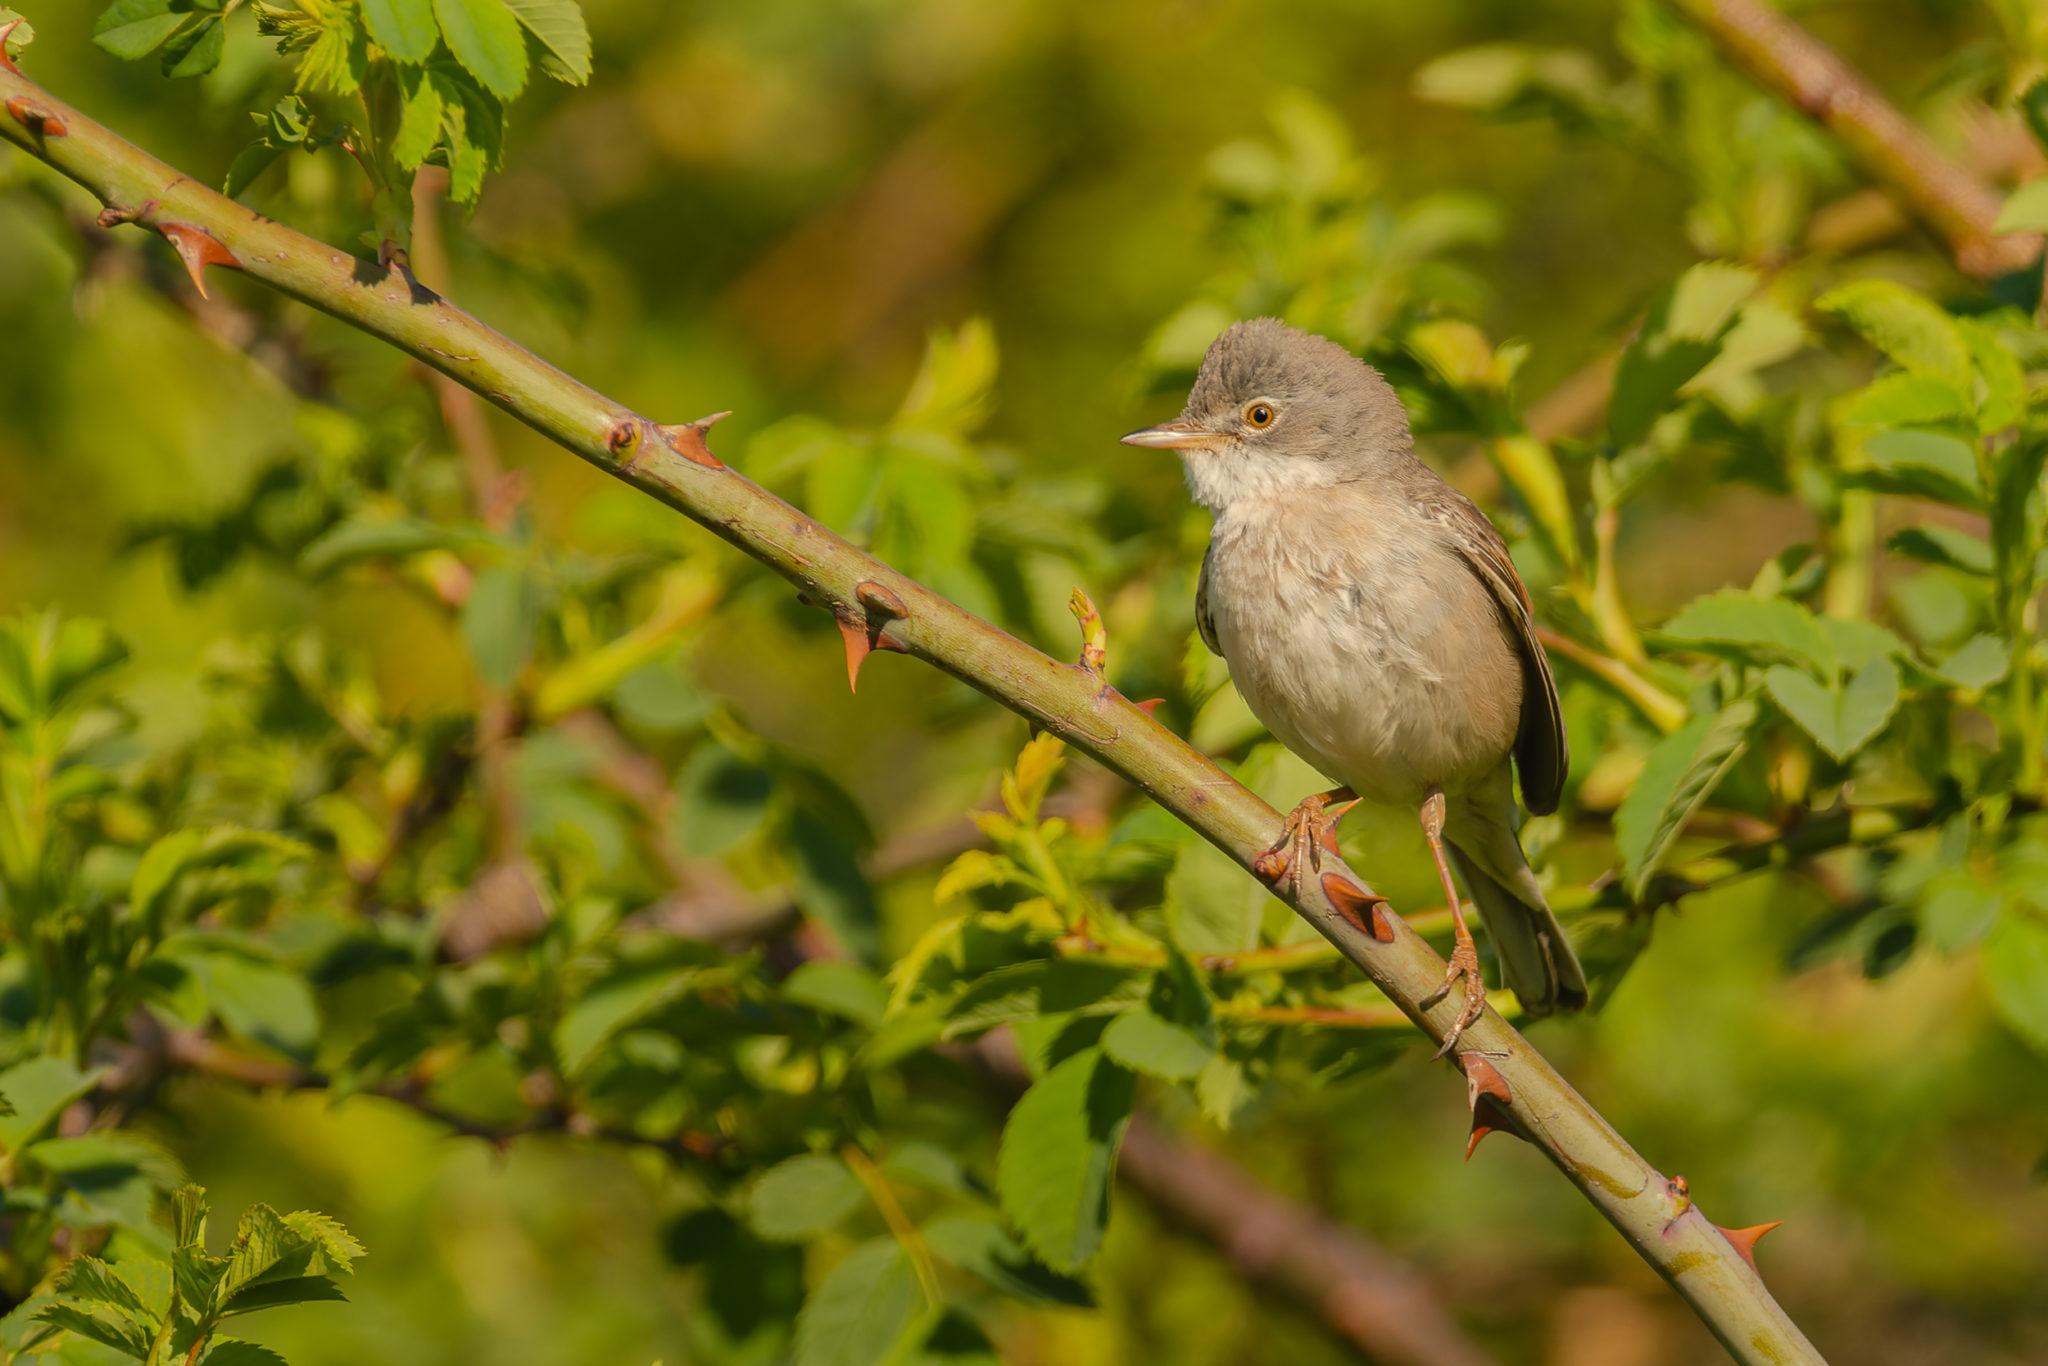 Dorngrasmücke (Sylvia communis), Naturfotografie Olaf & Sylvia Rentzsch